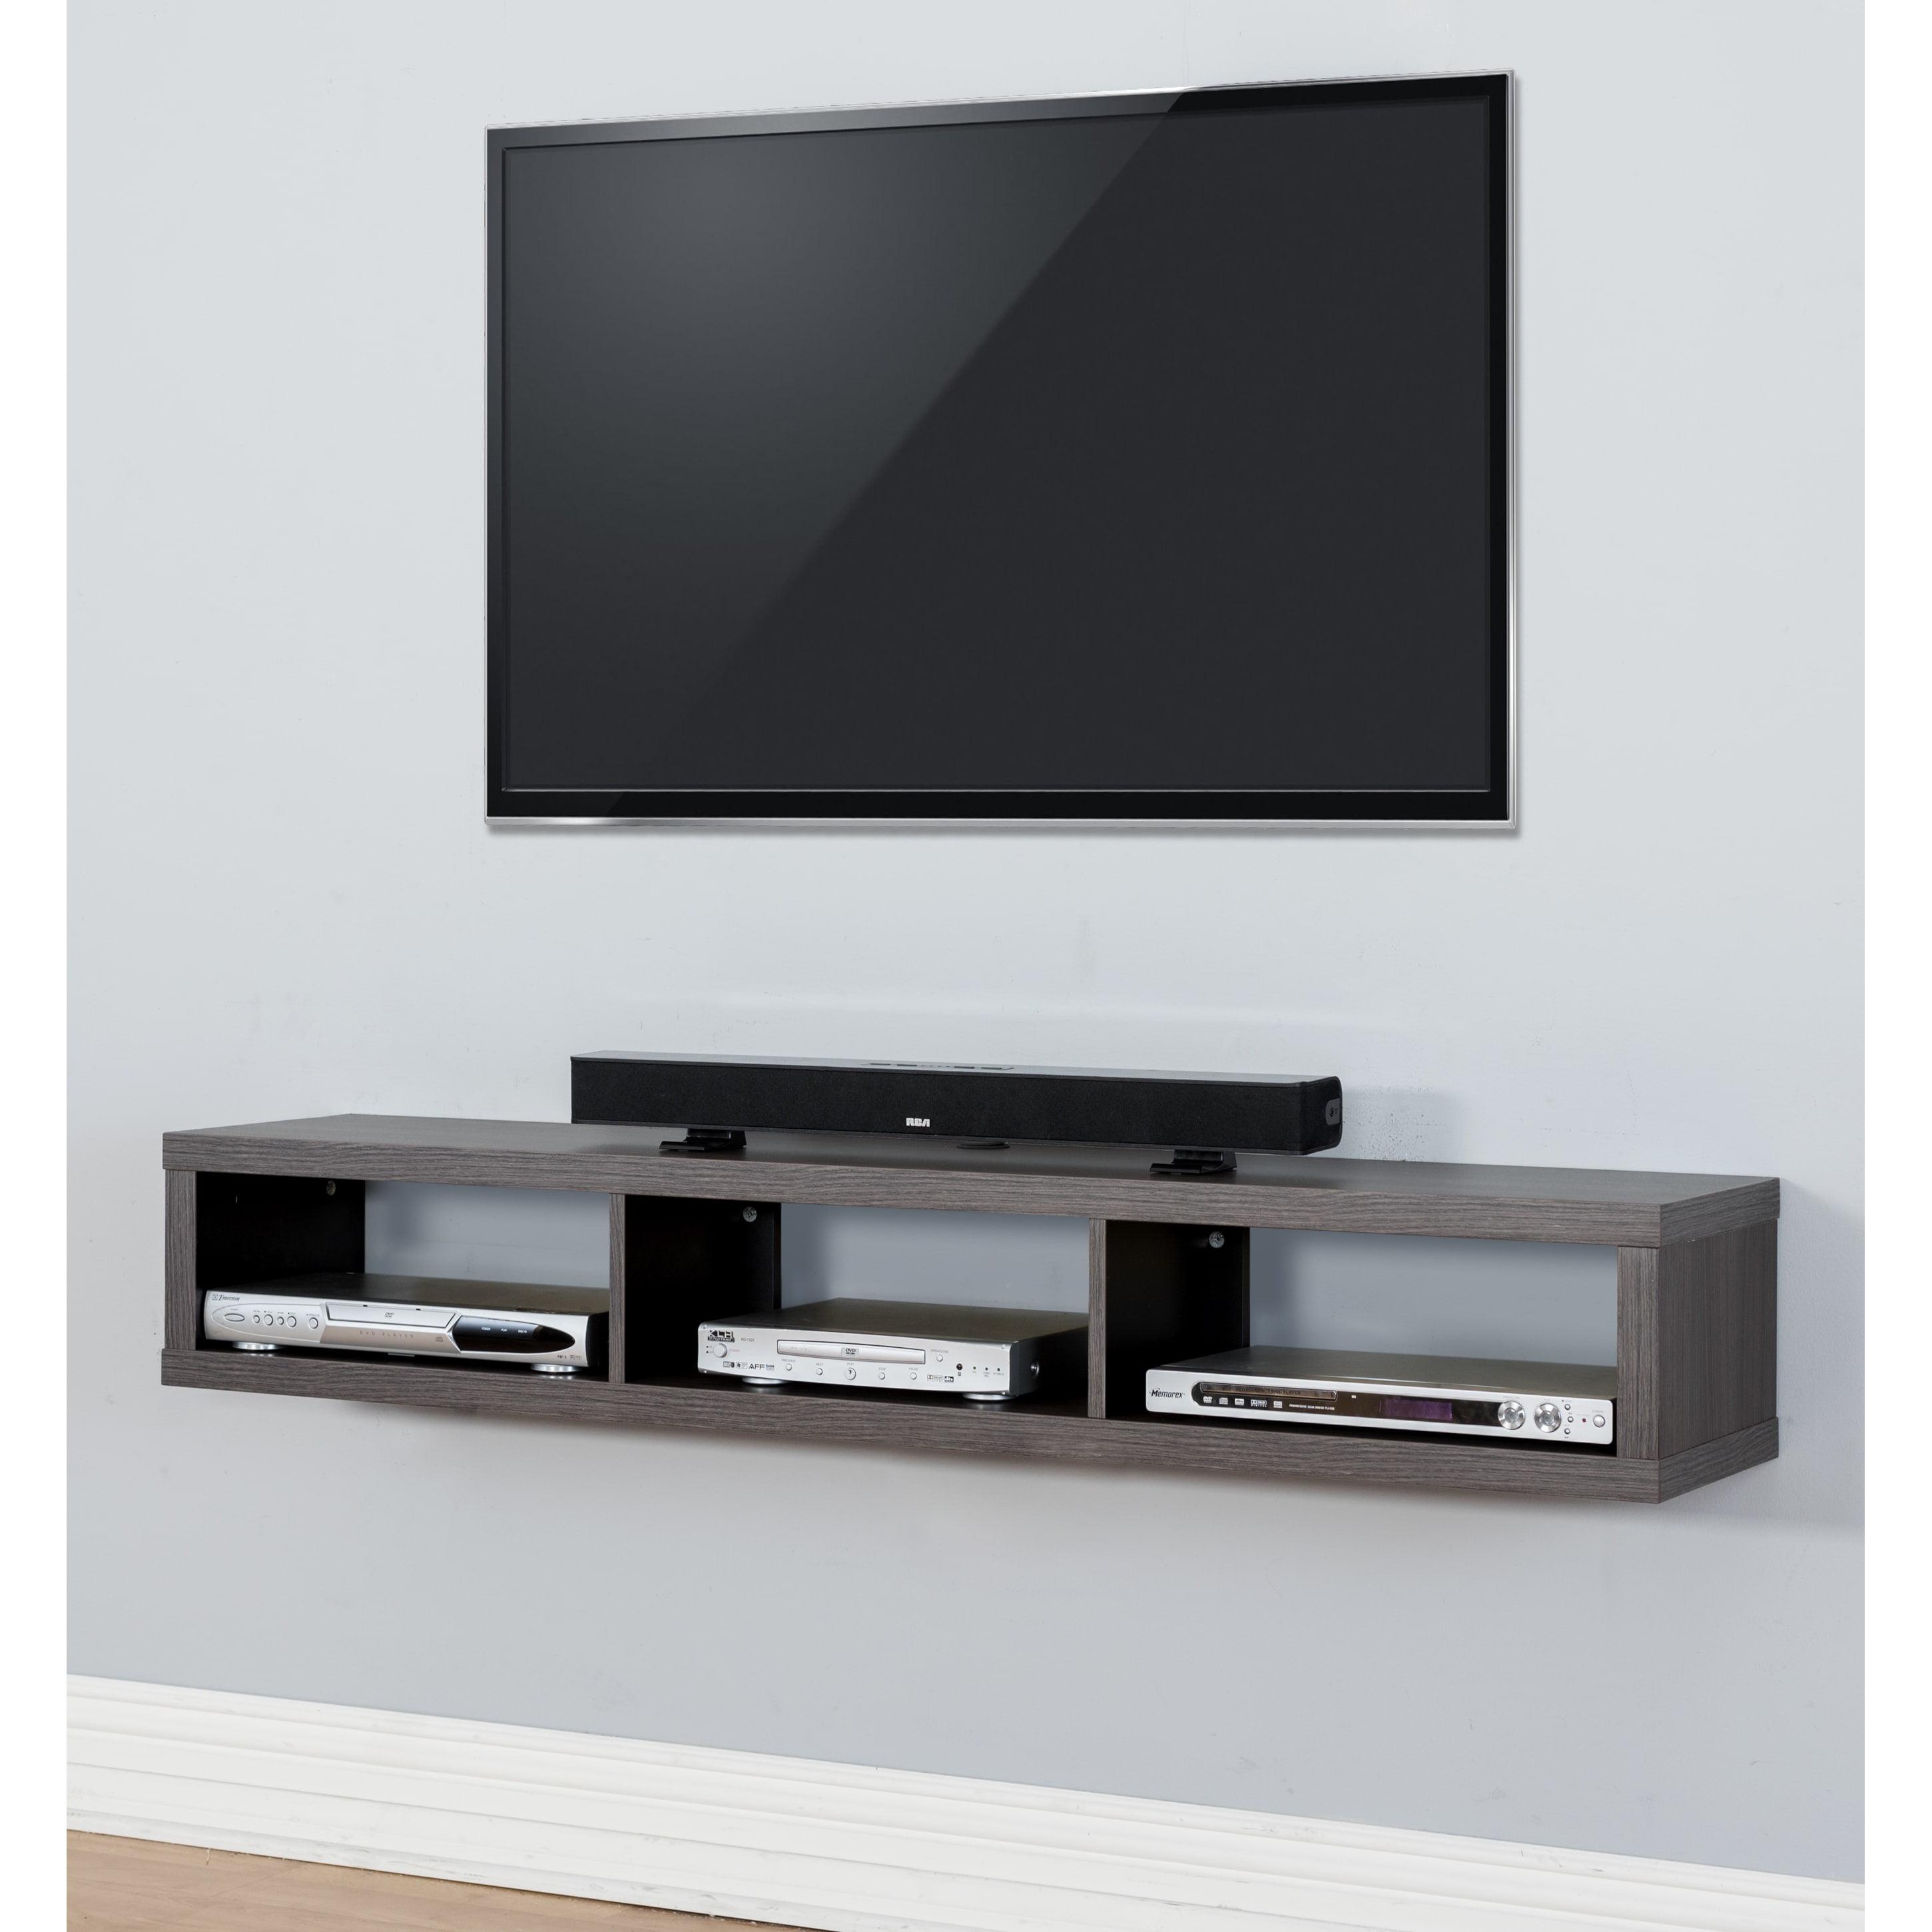 Martin Thin 60-inch Wall Mount TV Console - Walmart.com